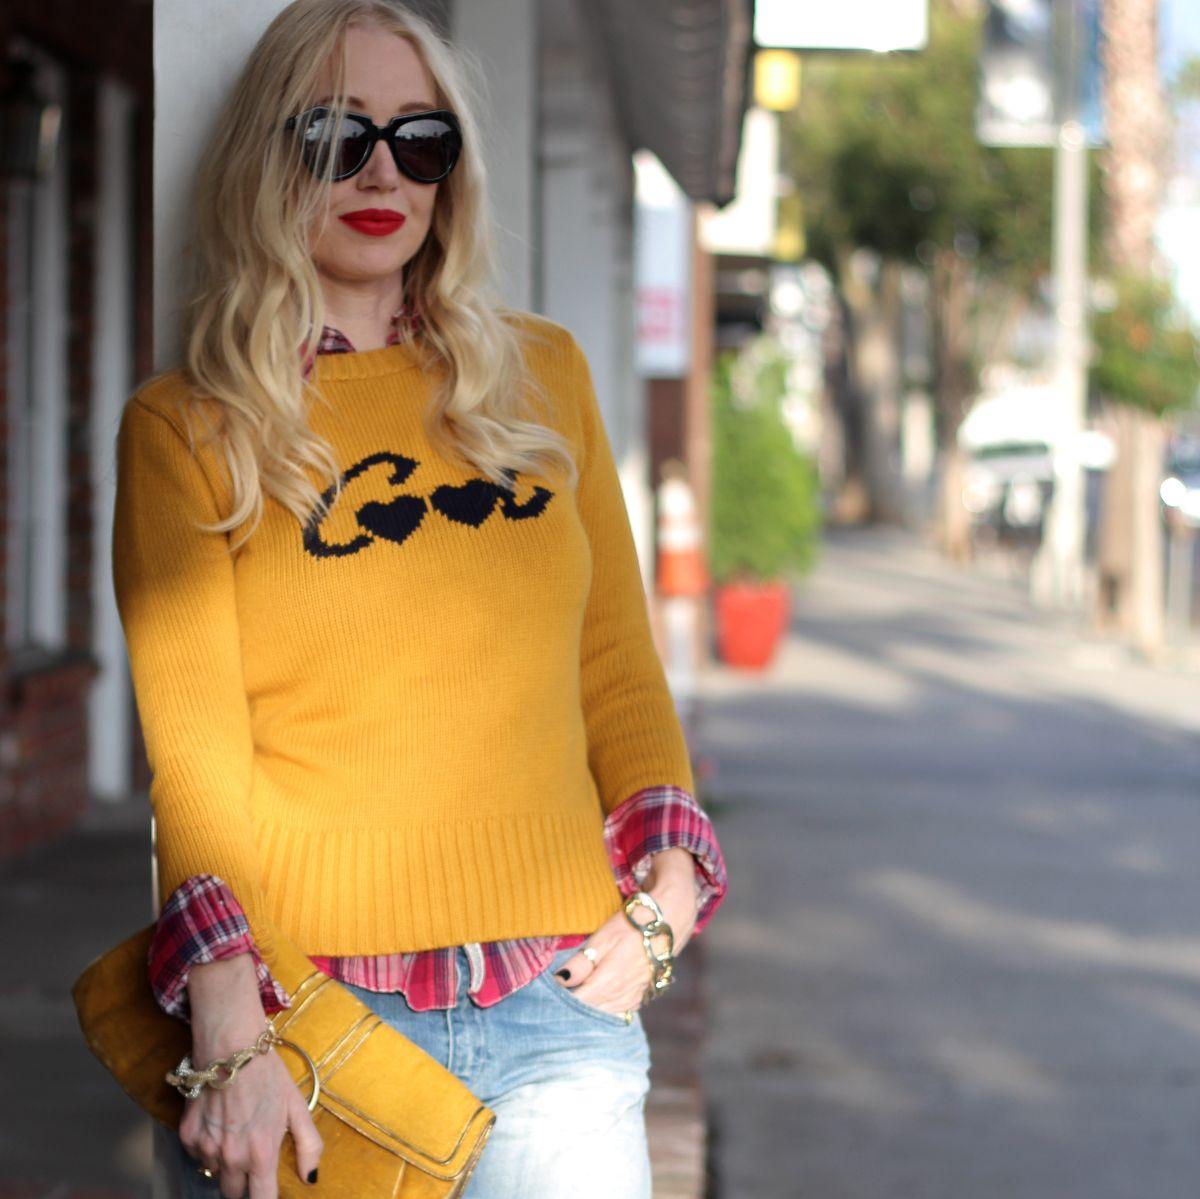 zara cool sweater, zara yellow sweater, karen walker sunglasses, stila beso, stila beso lipstick